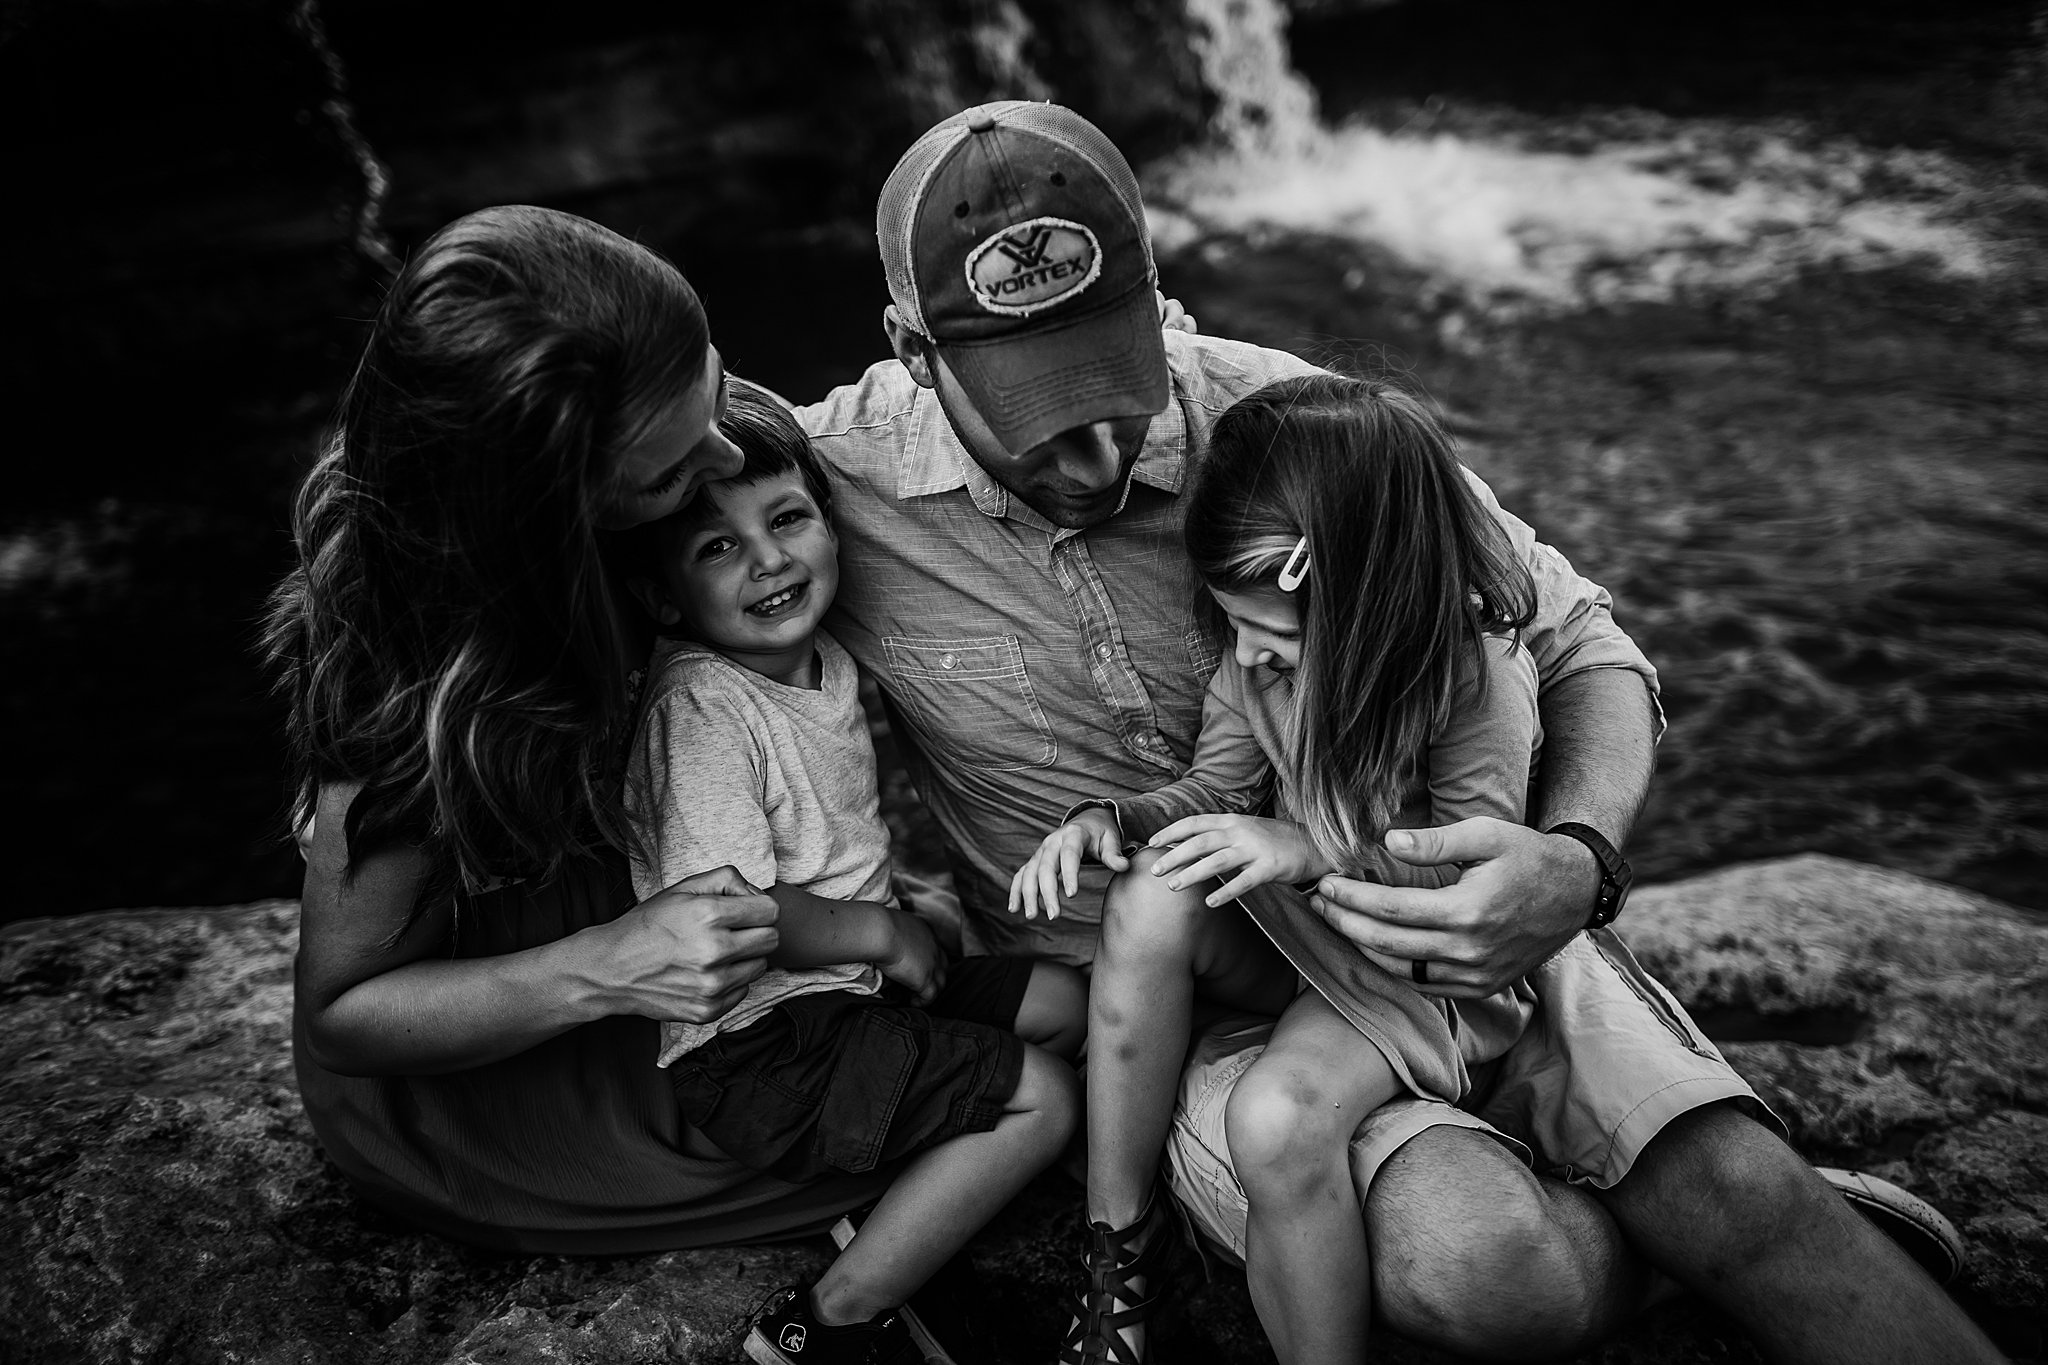 Tunnell-San-Antonio-Family-Photographer-15_WEB.jpg